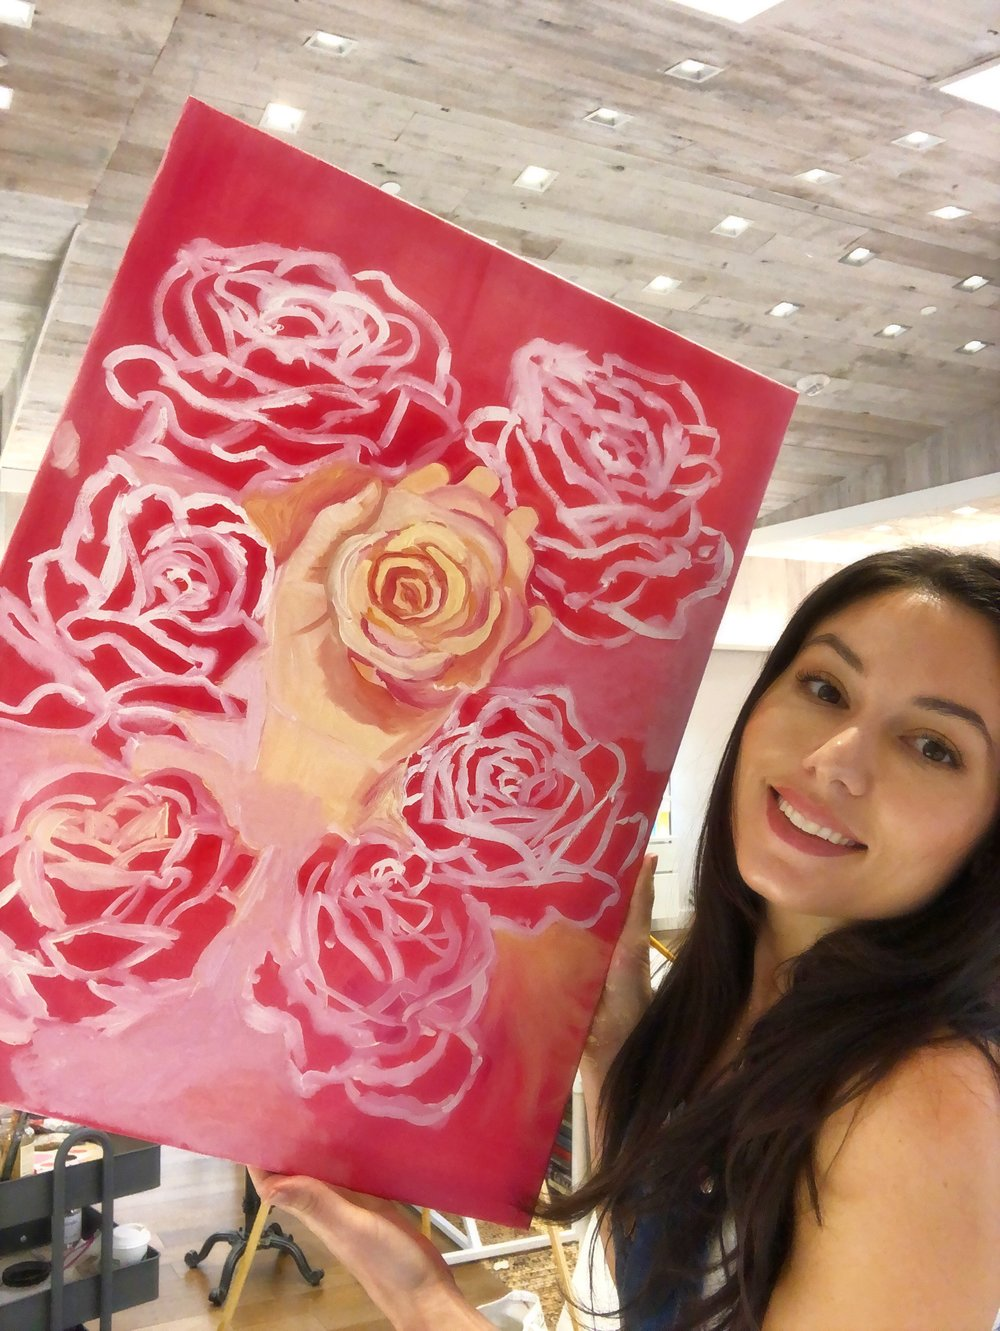 katrina-eugenia-philosophy-skincare-love-philosophy-amazing-grace-amazing-grace-ballet-rose-live-painting-oil-painting10.JPG